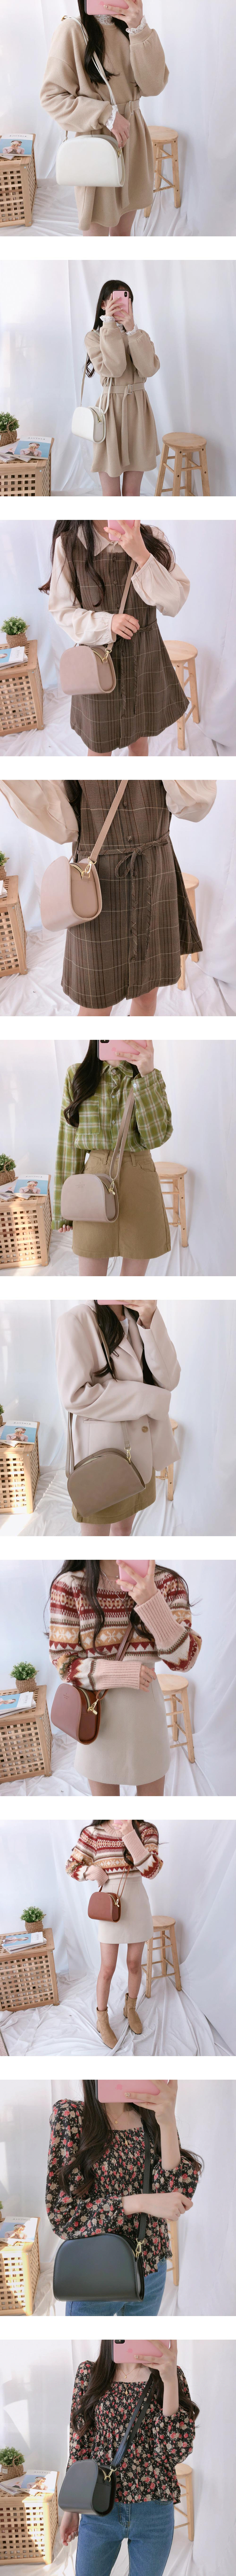 925 Half Moon Shoulder Bag